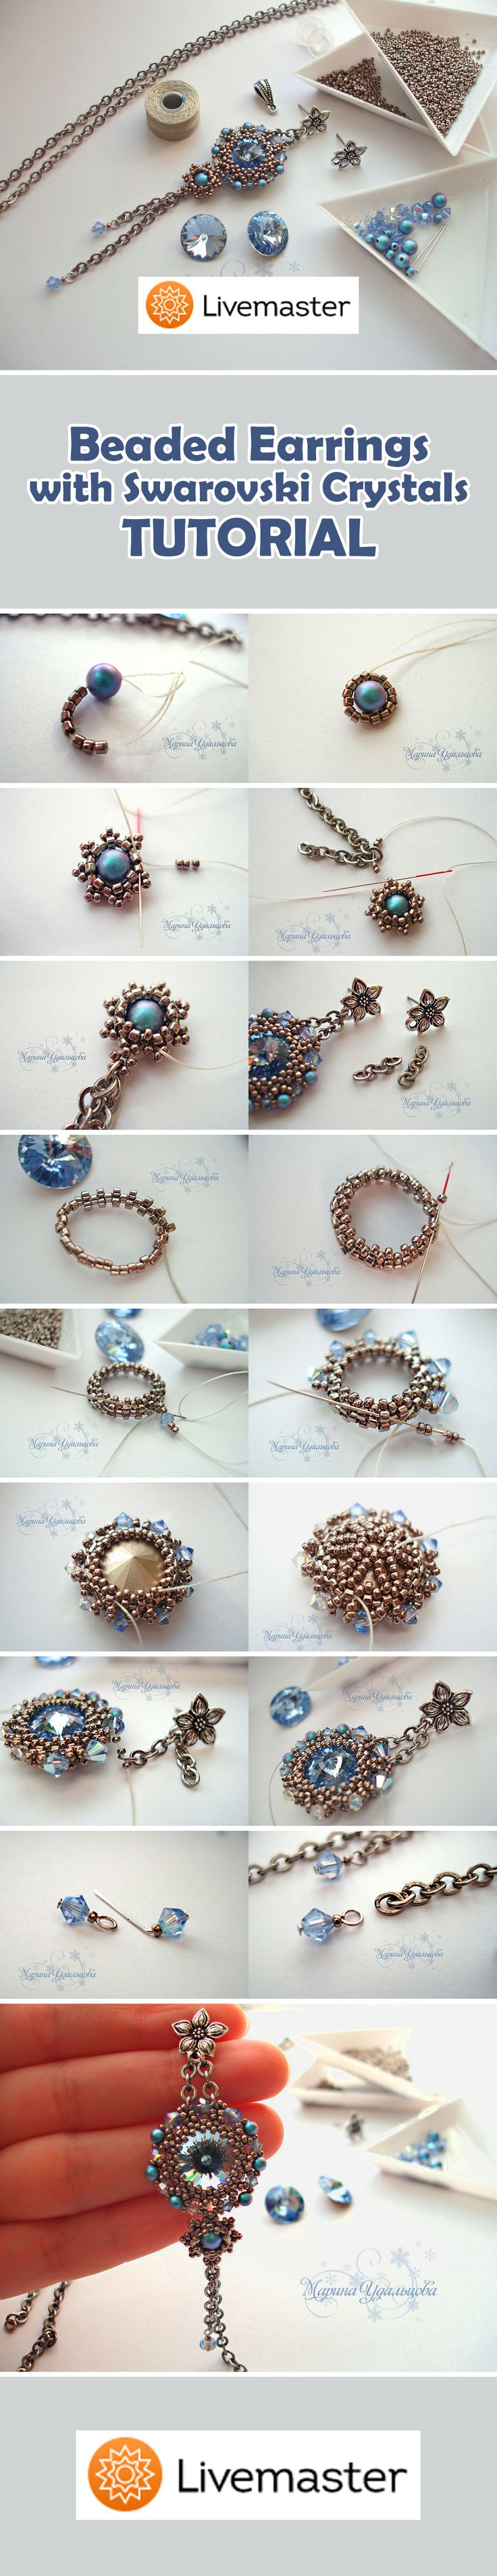 Beaded Earrings with Swarovski Crystals TUTORIAL | Подробный мастер-класс: длинные серьги «Enchained Ice» из бисера с элементами Сваровски